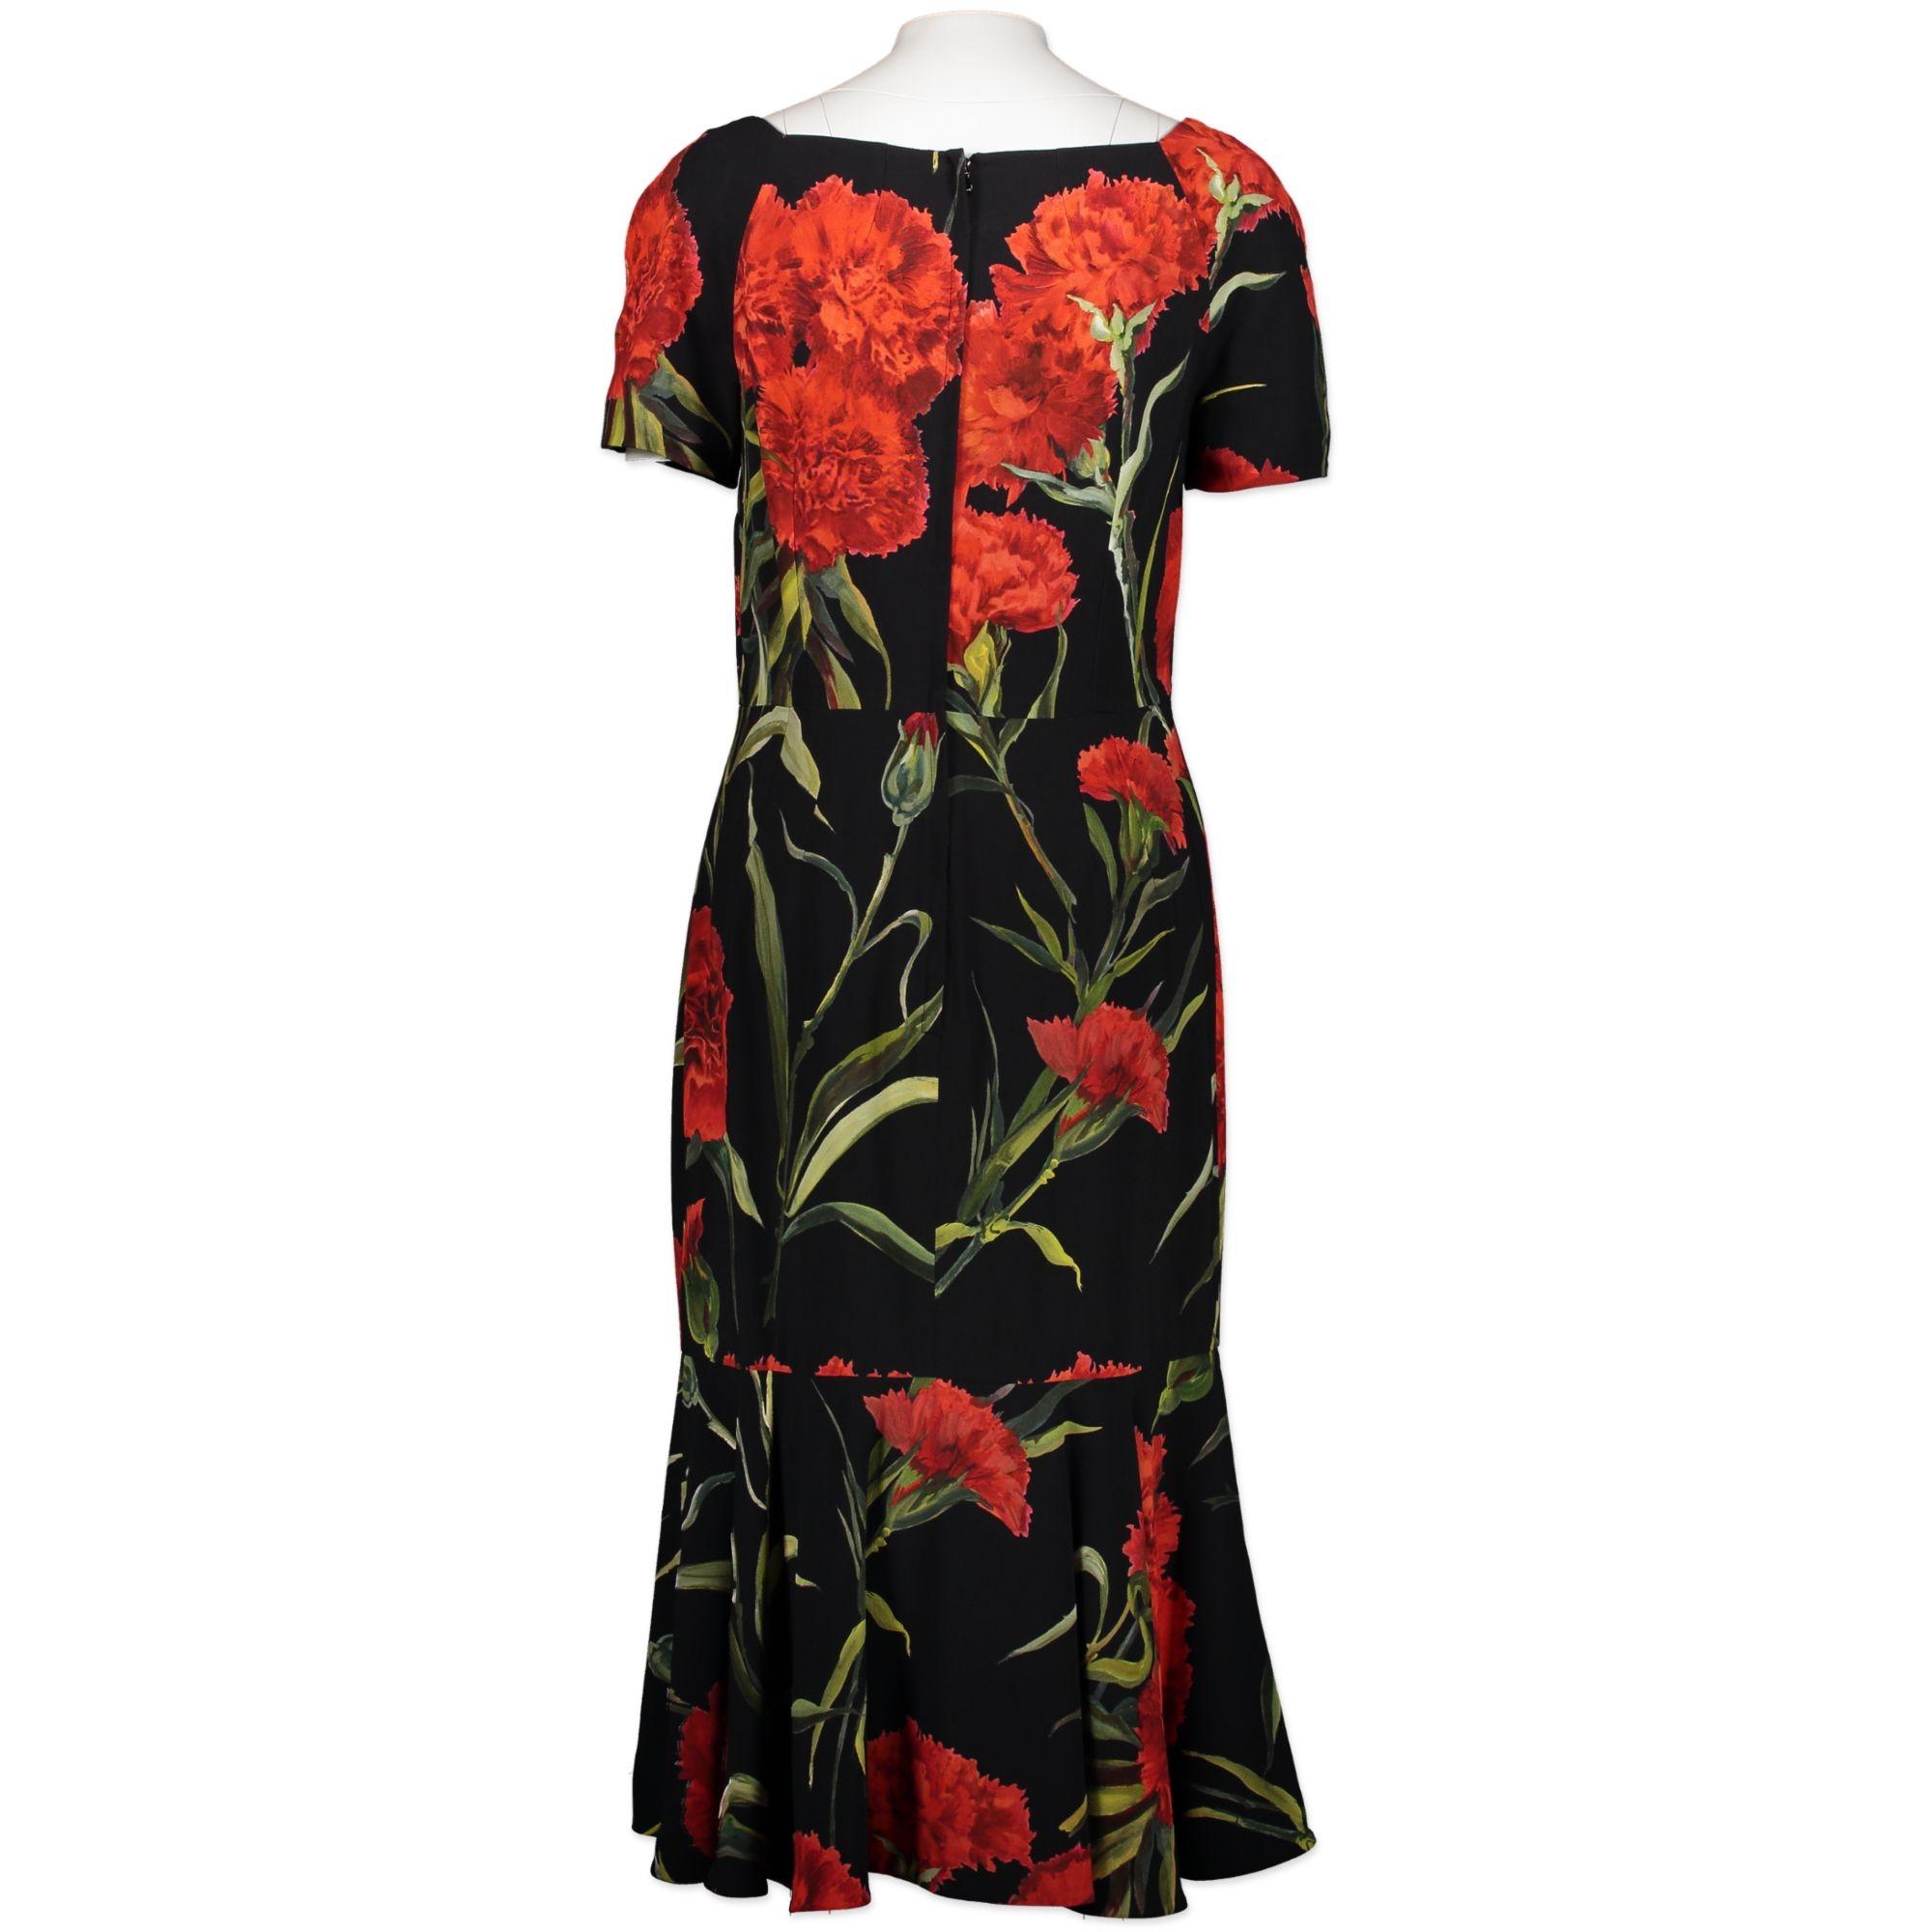 Dolce & Gabbana Flower Print Black Dress - Size 46